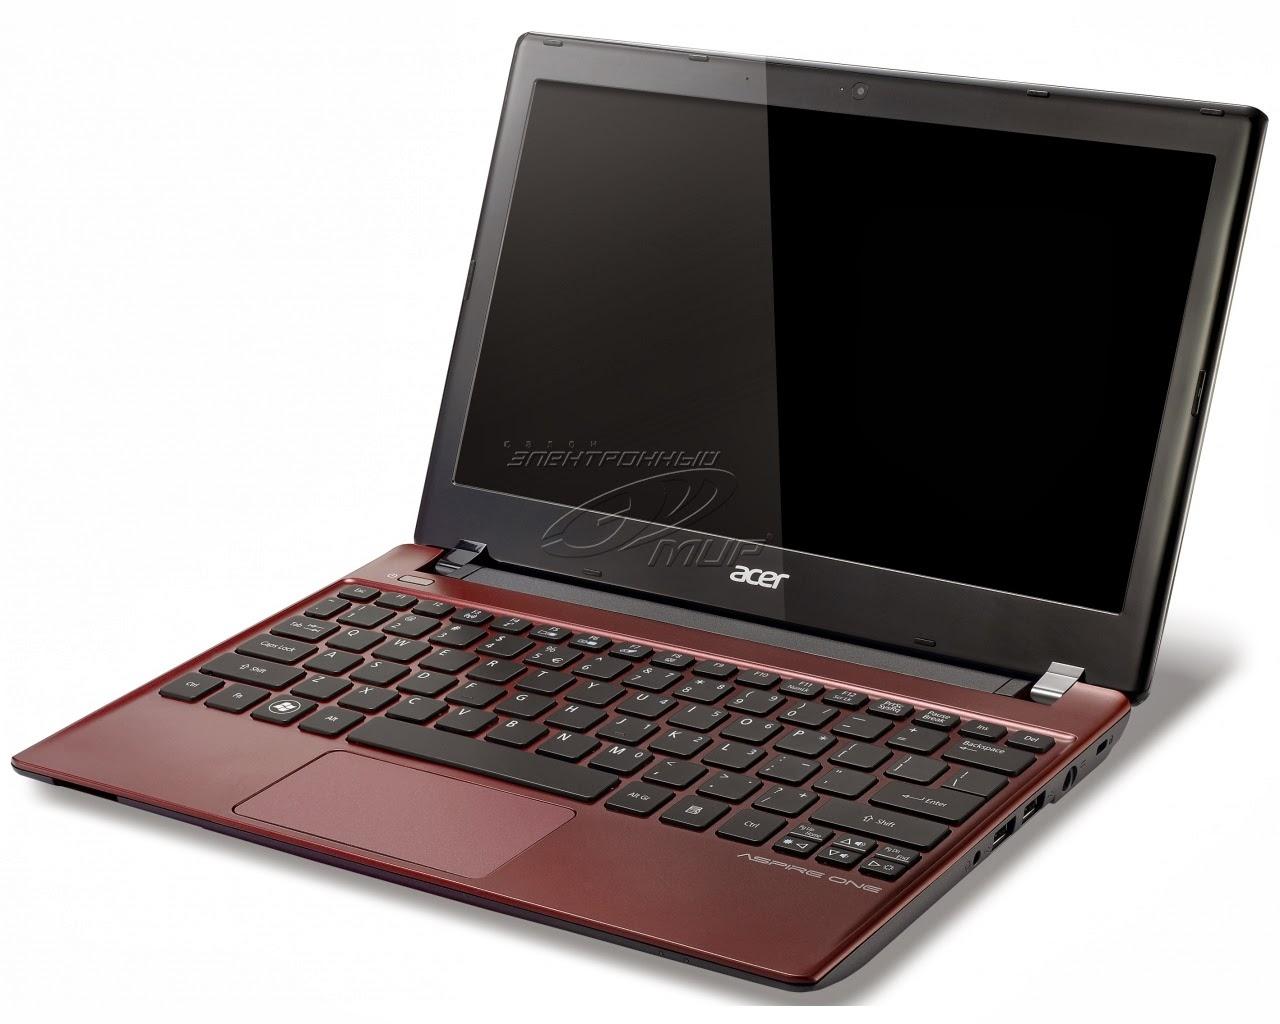 Harga Notebook 7 Inchi Spesifikasi Harga Toshiba Nb520 1069 101 Inchi Windows 7 Spesifikasi Dan Harga Laptop Acer Aspire One 756 Harga Laptop Kamera